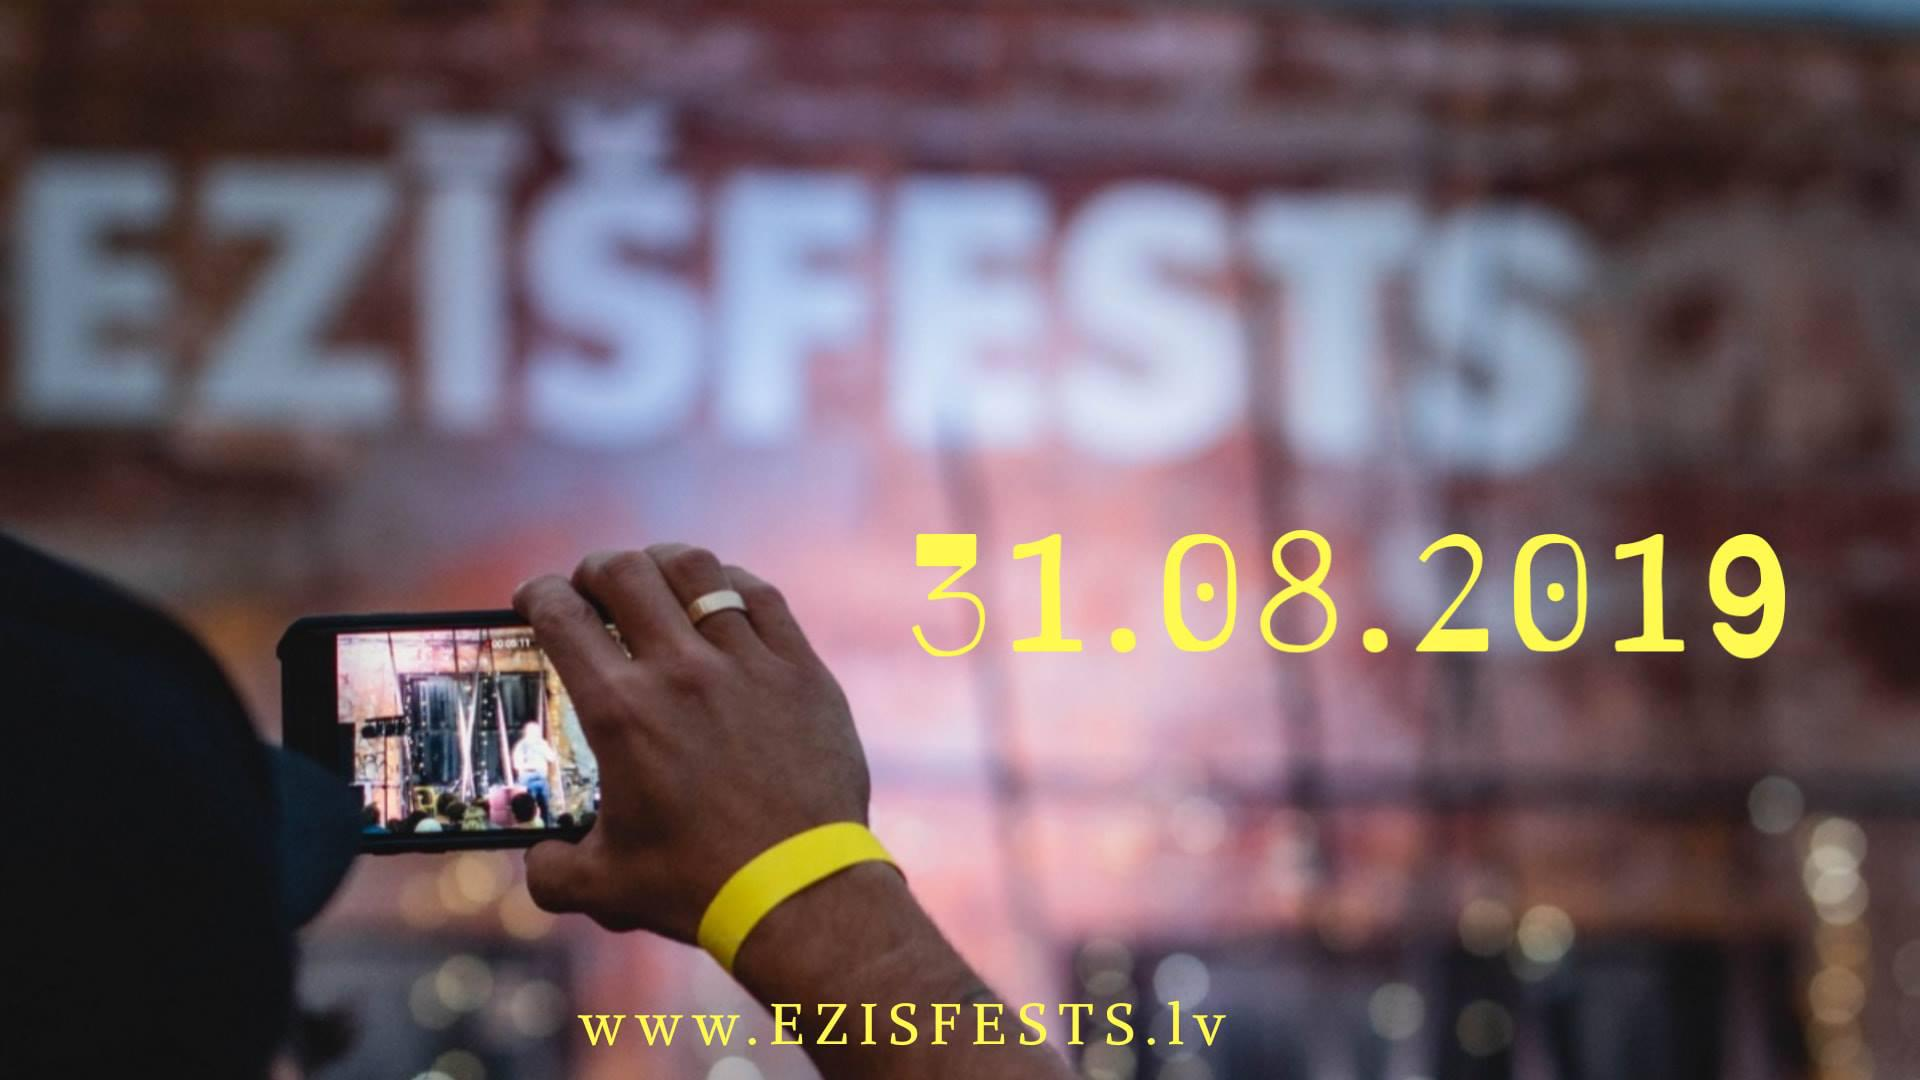 Ezīšfests 2019 – Kronis vasarai!